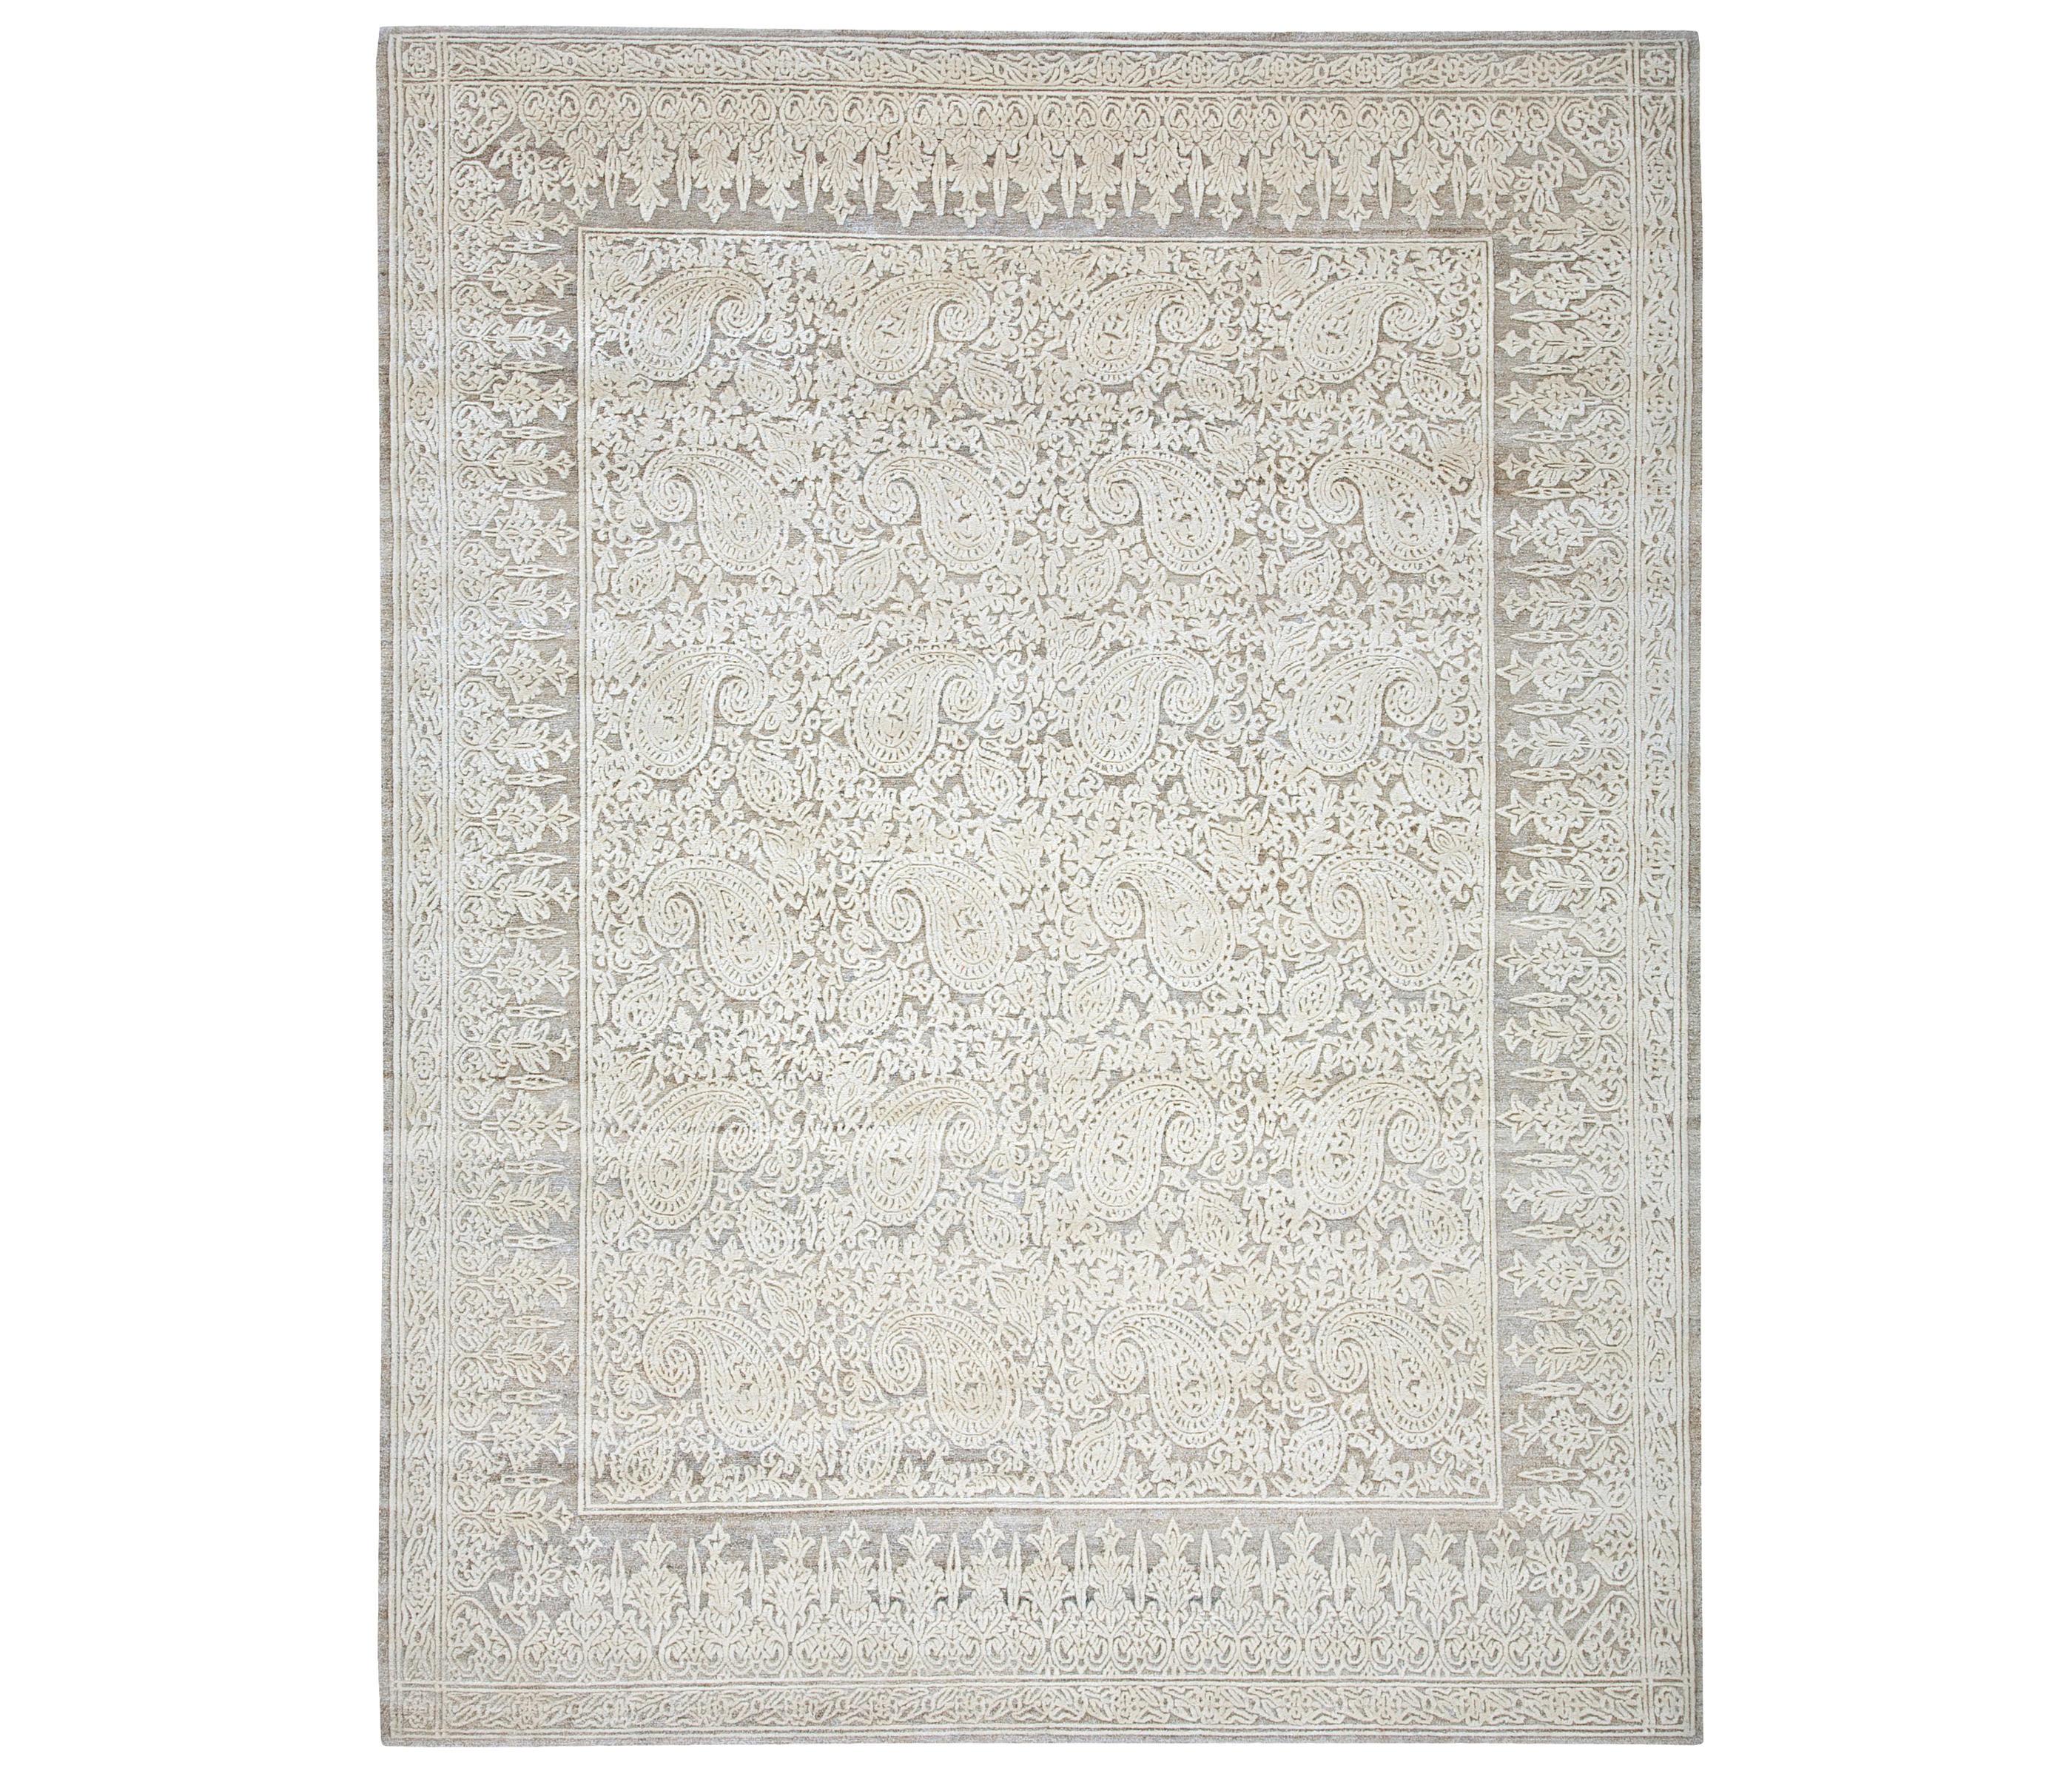 classic agra tapis tapis design de jan kath architonic. Black Bedroom Furniture Sets. Home Design Ideas